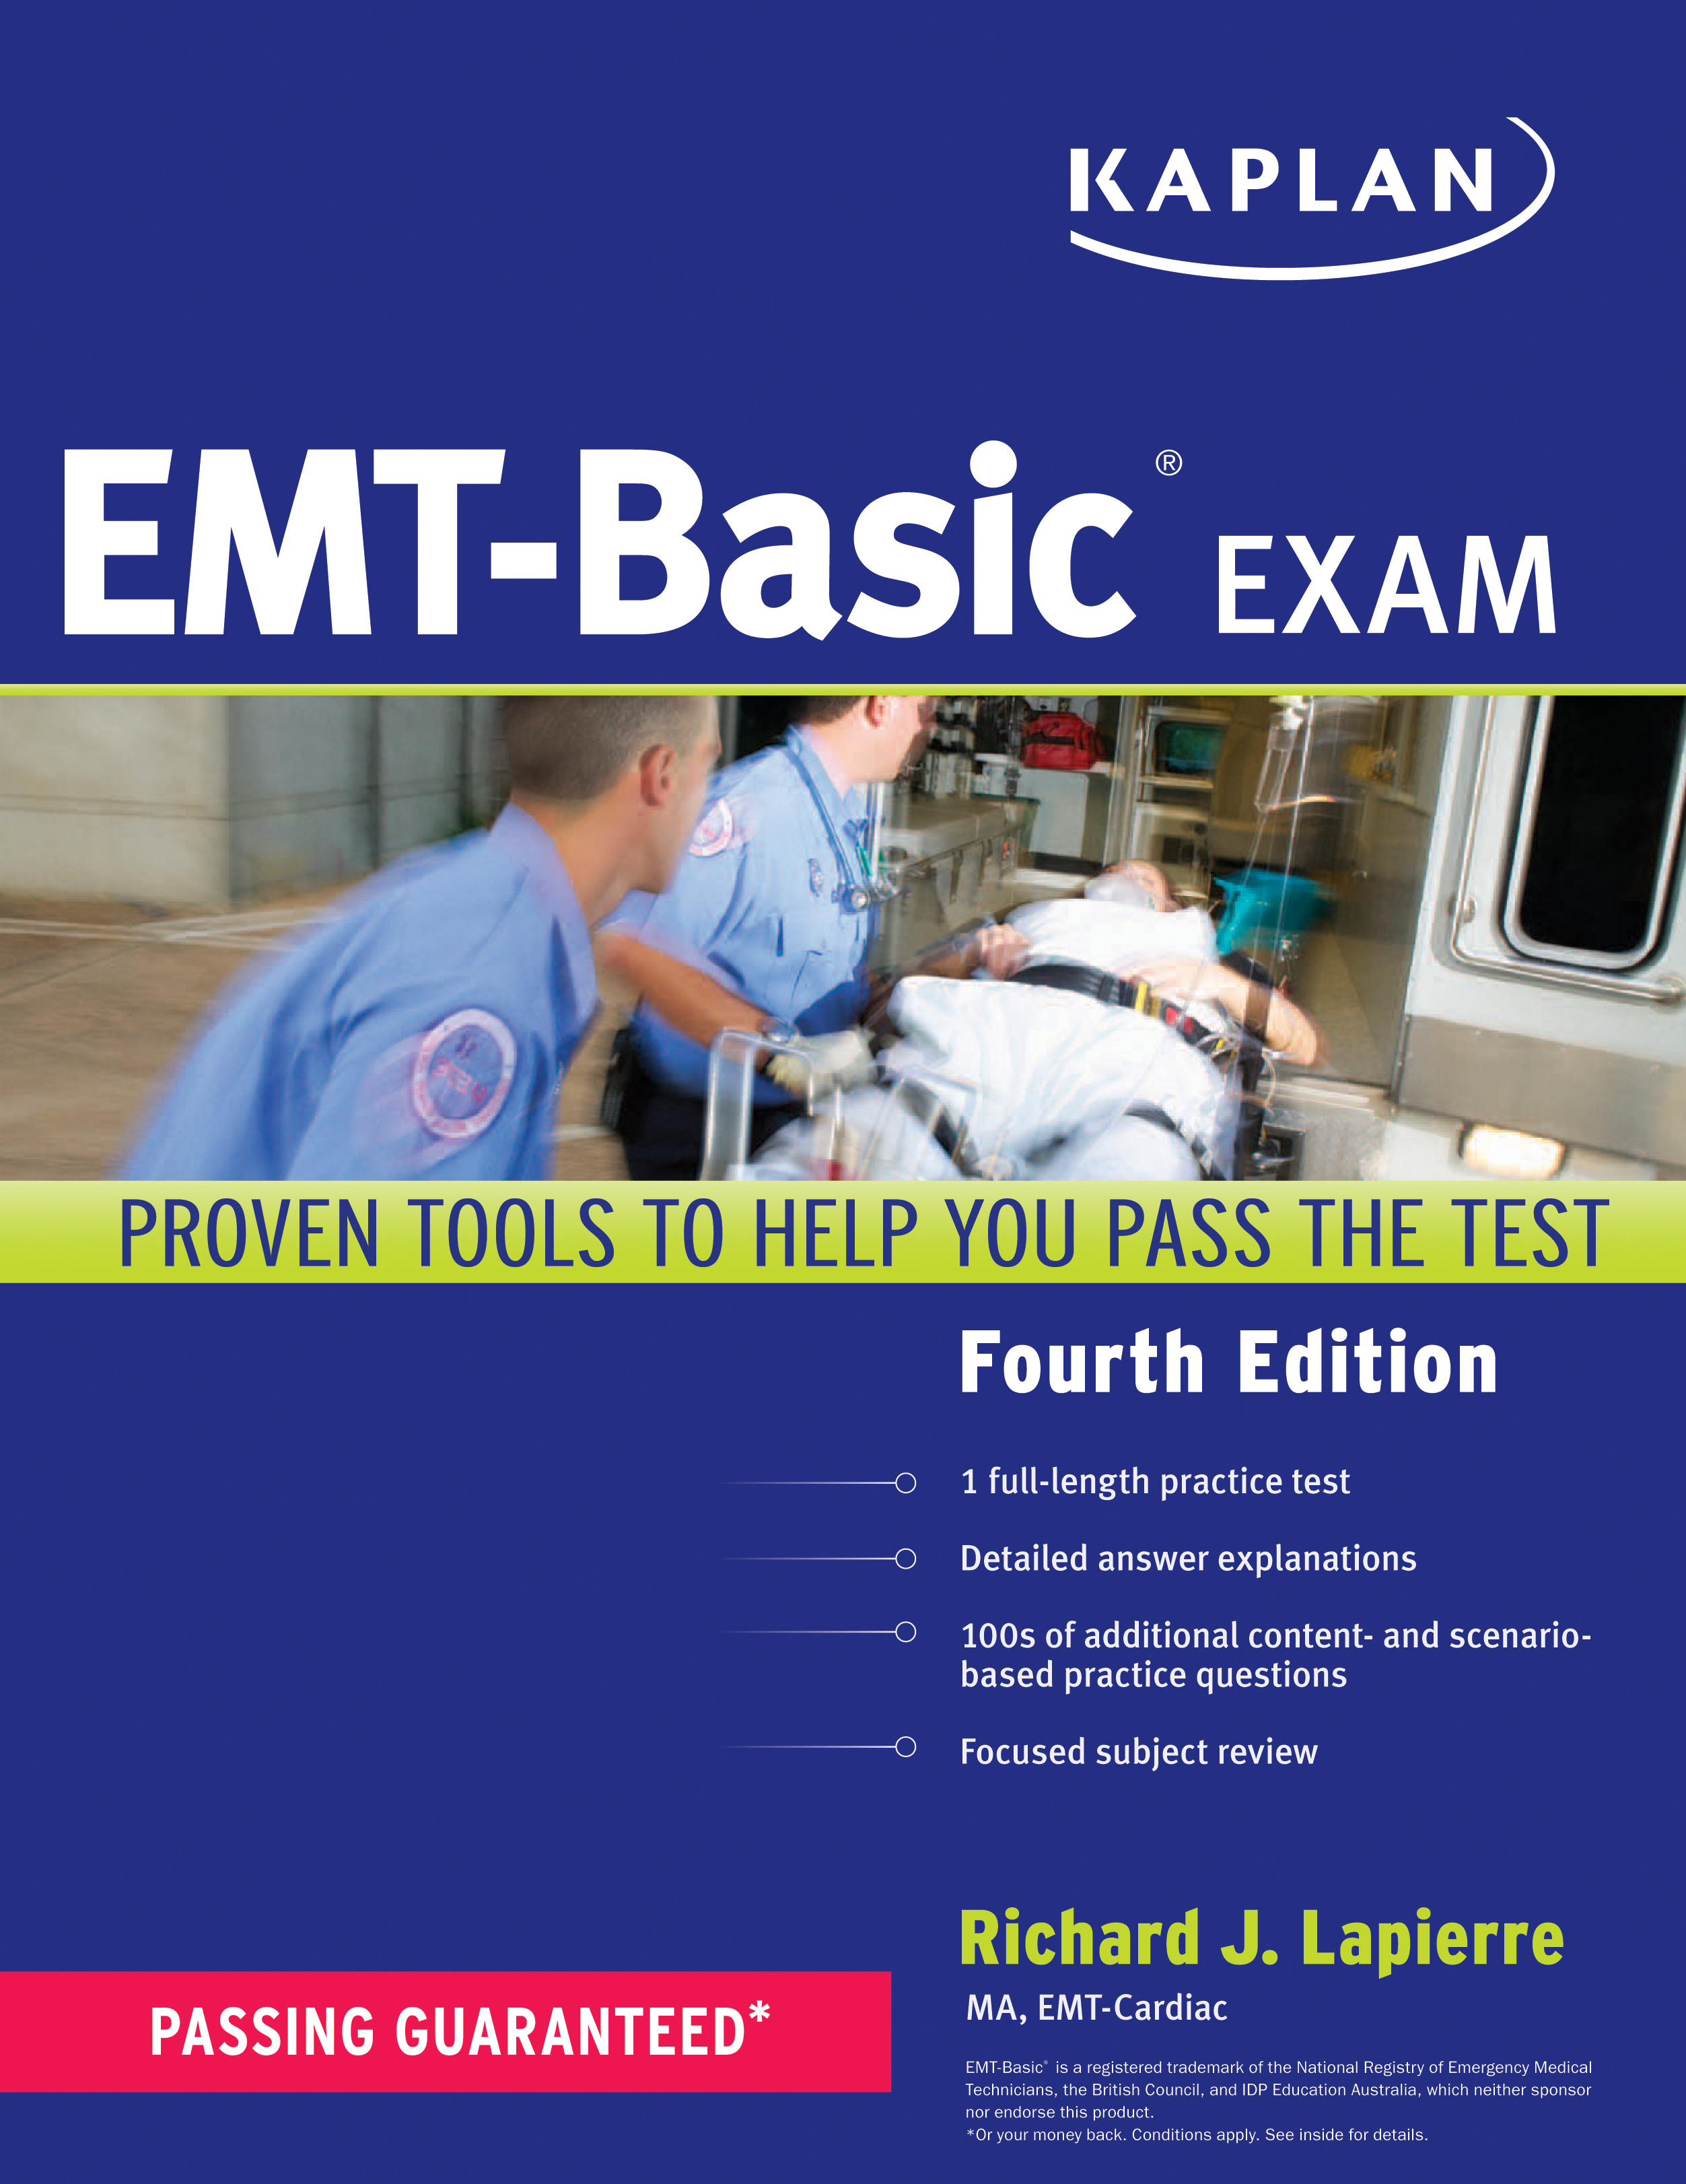 Book Cover Image (jpg): Kaplan EMT-Basic Exam